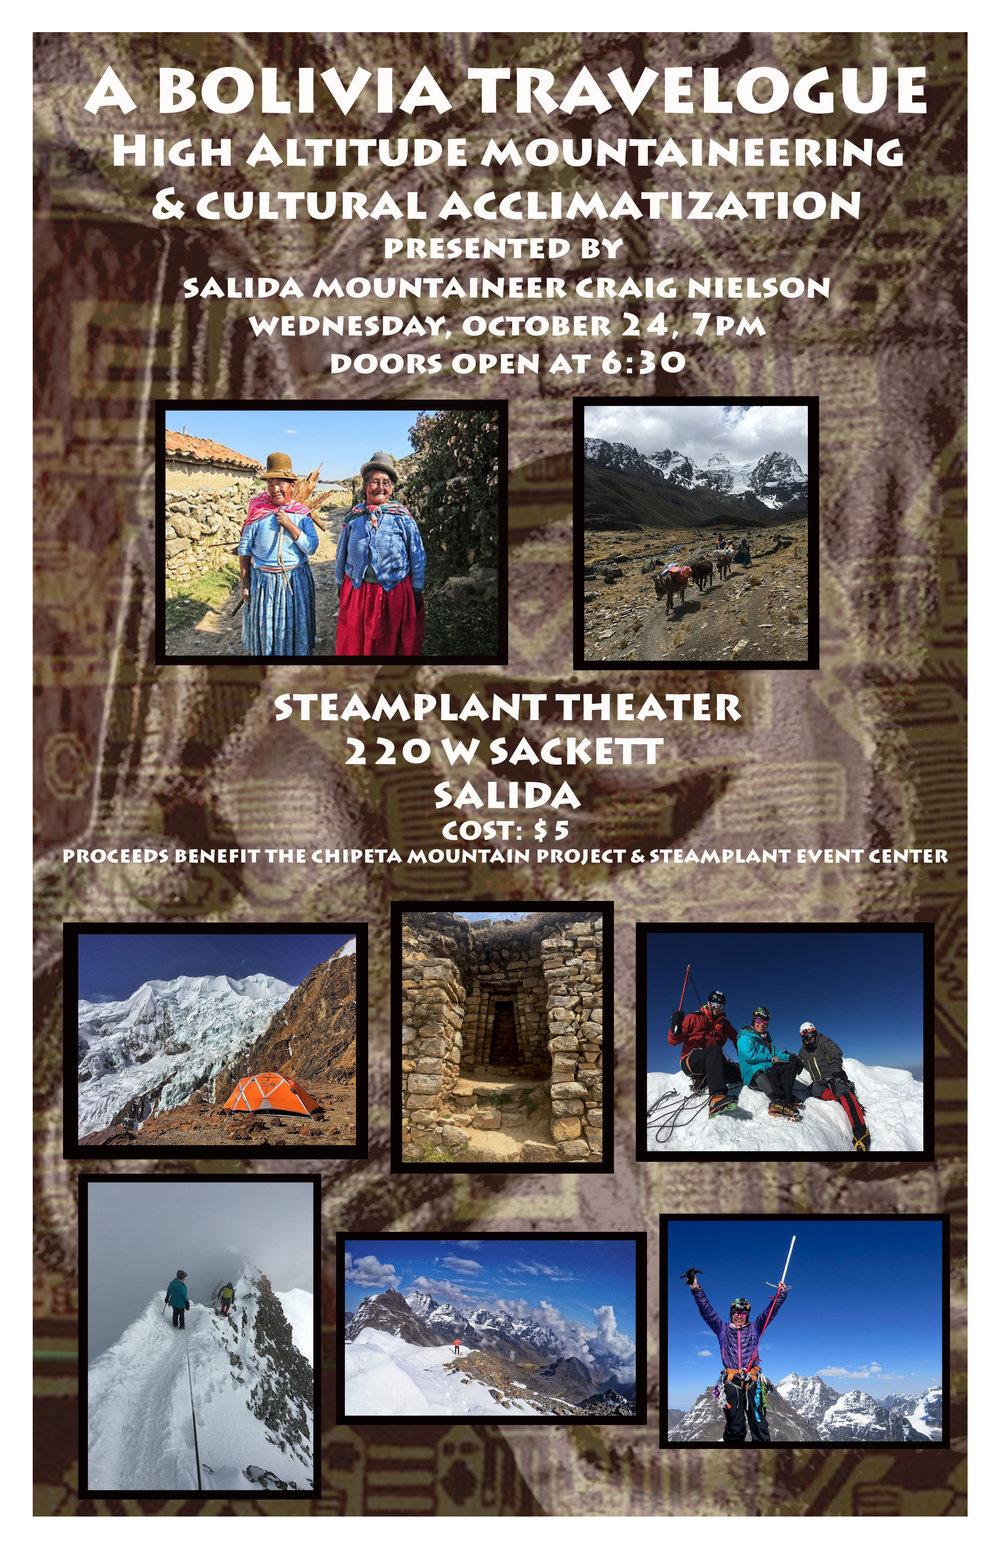 Bolivia Travelogue Poster.2.jpg